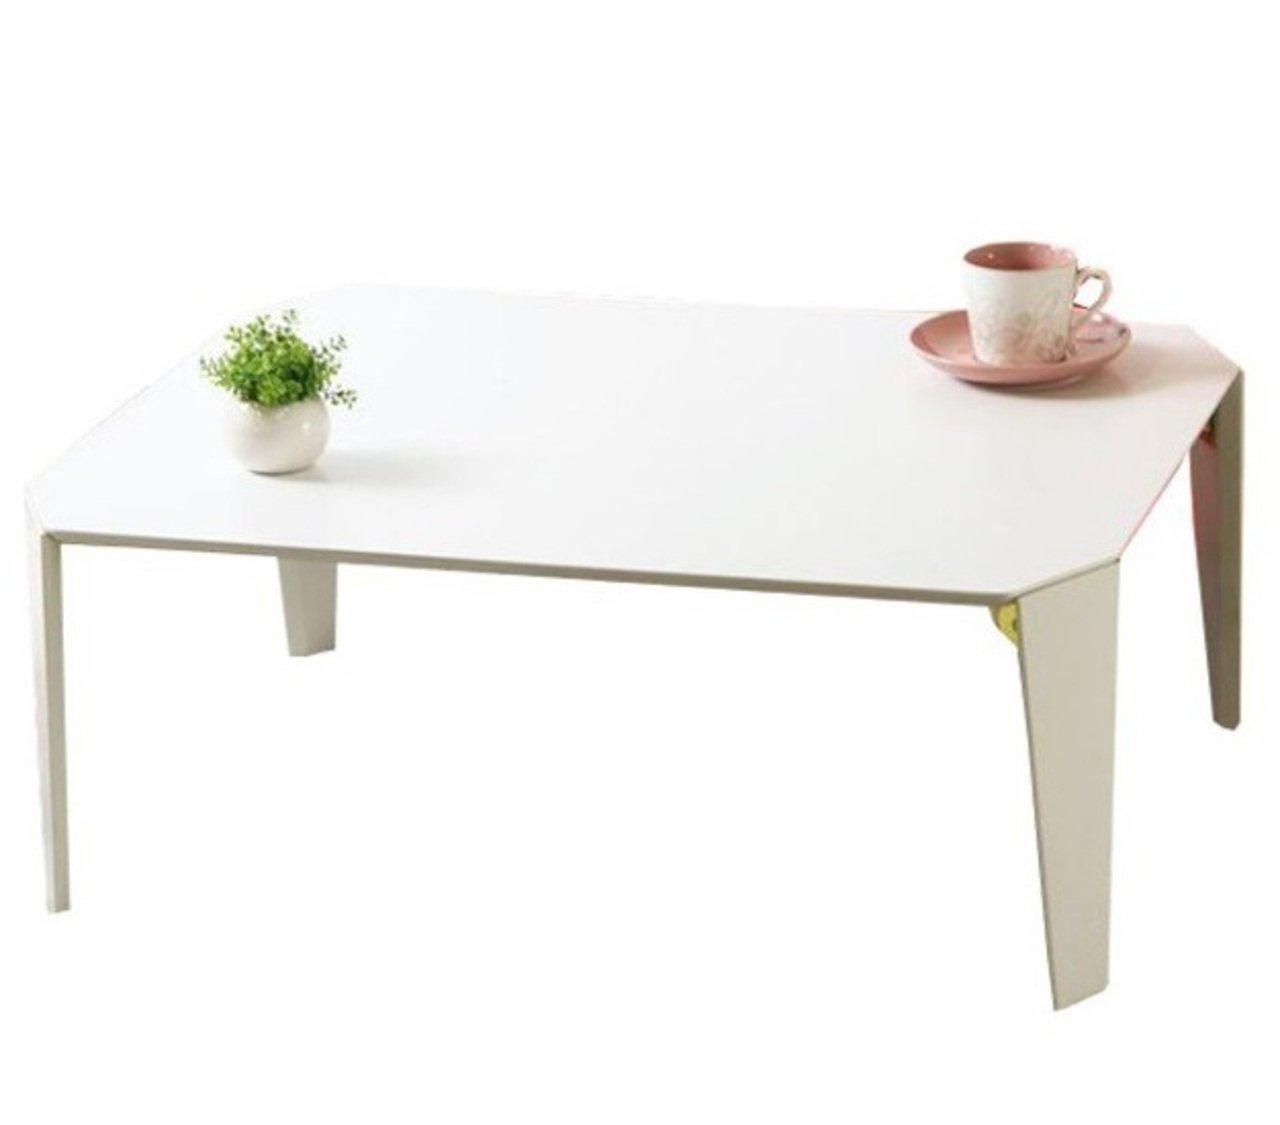 AHEART ローテーブル 折りたたみ 75cm幅 ひとり暮らし コンパクト 完成品 SI 201 ホワイト B07CVQ39J6  ホワイト